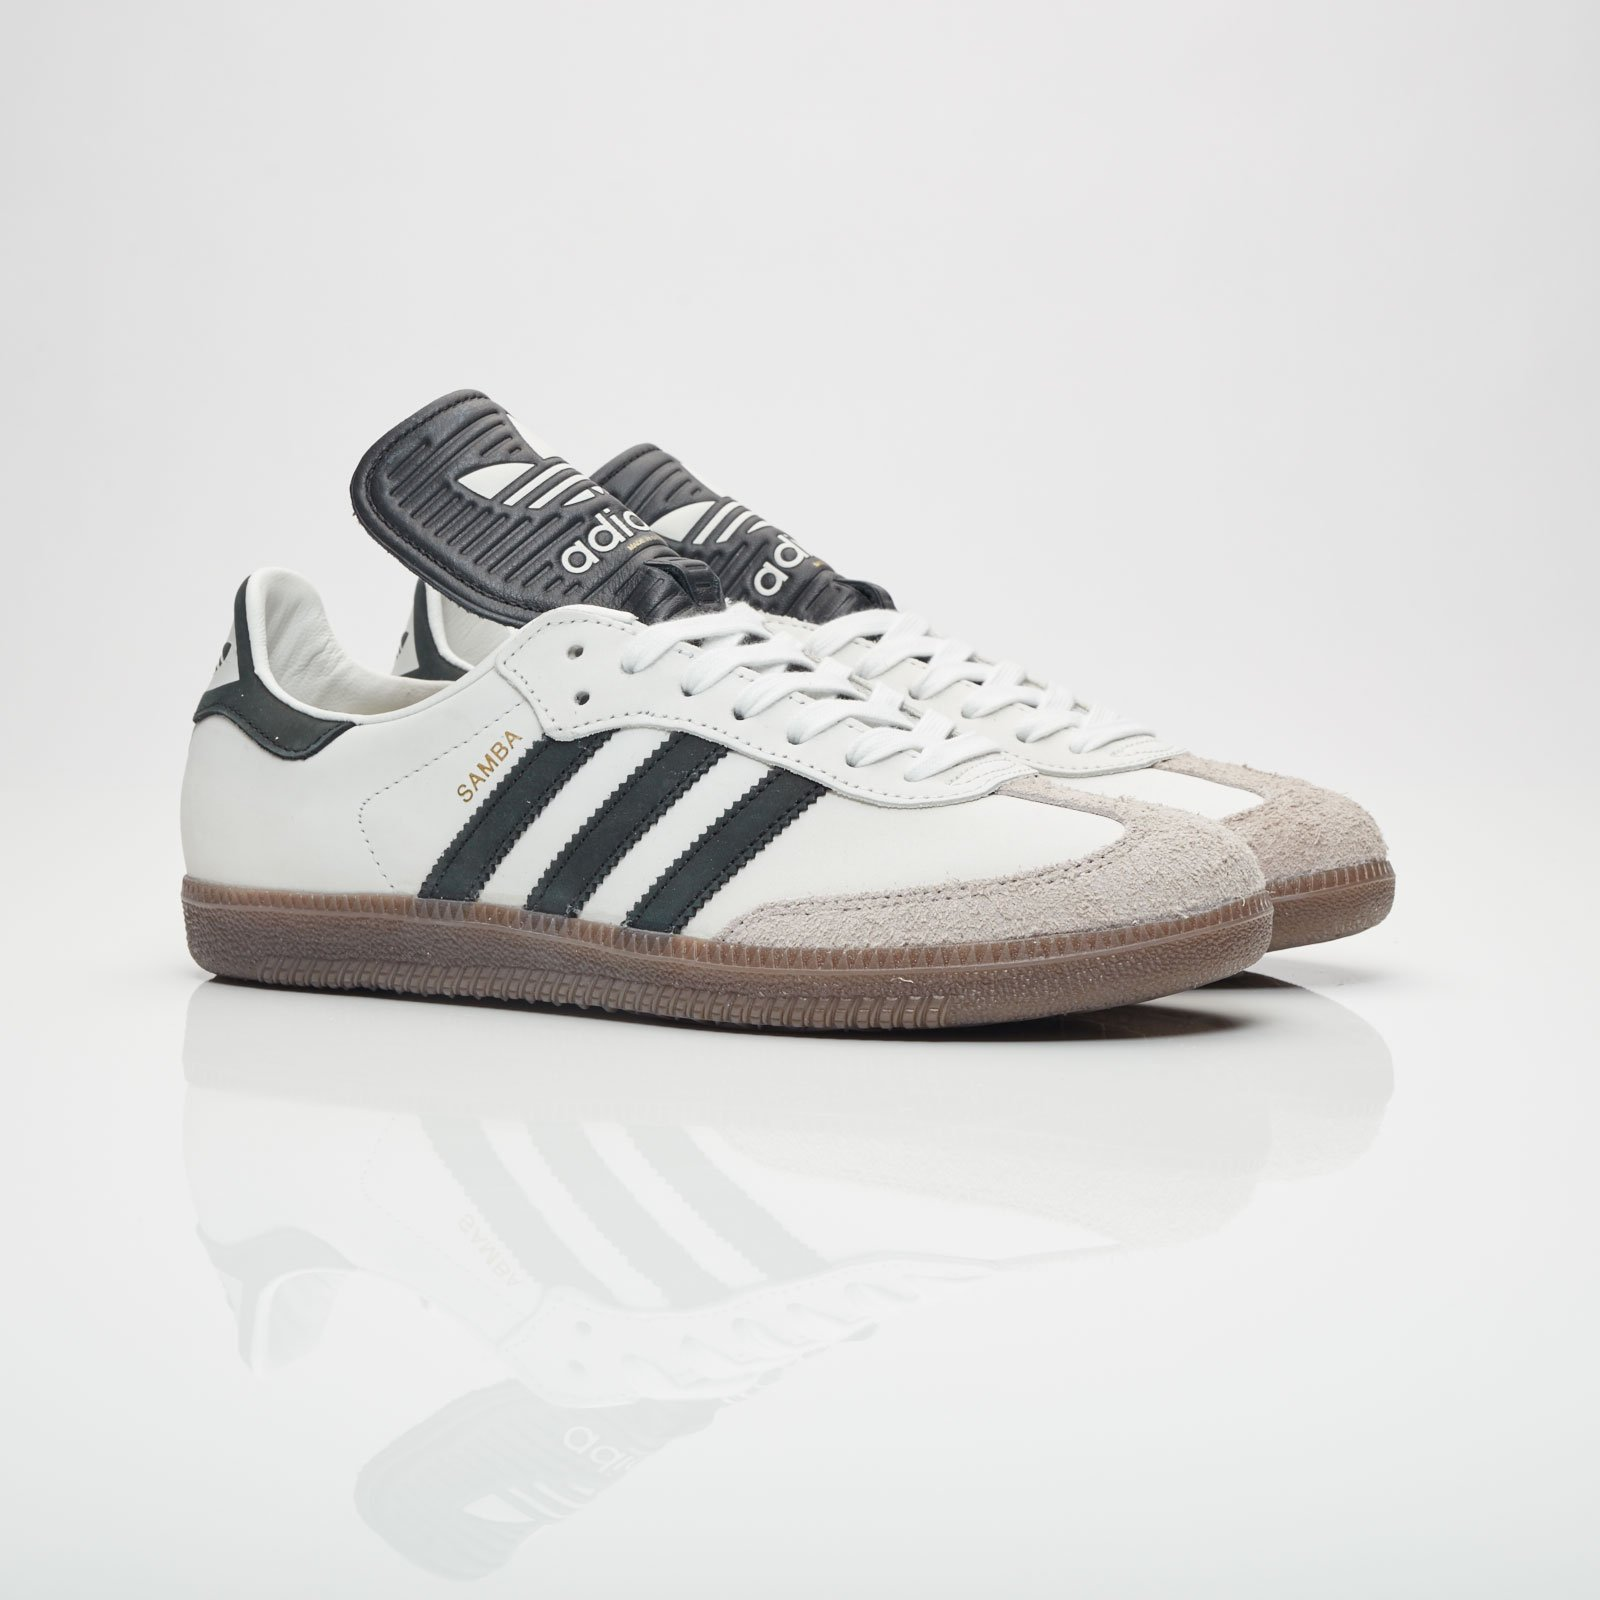 Adidas Originals Samba OG MIG | Weiß | Skate Schuhe | BB2587